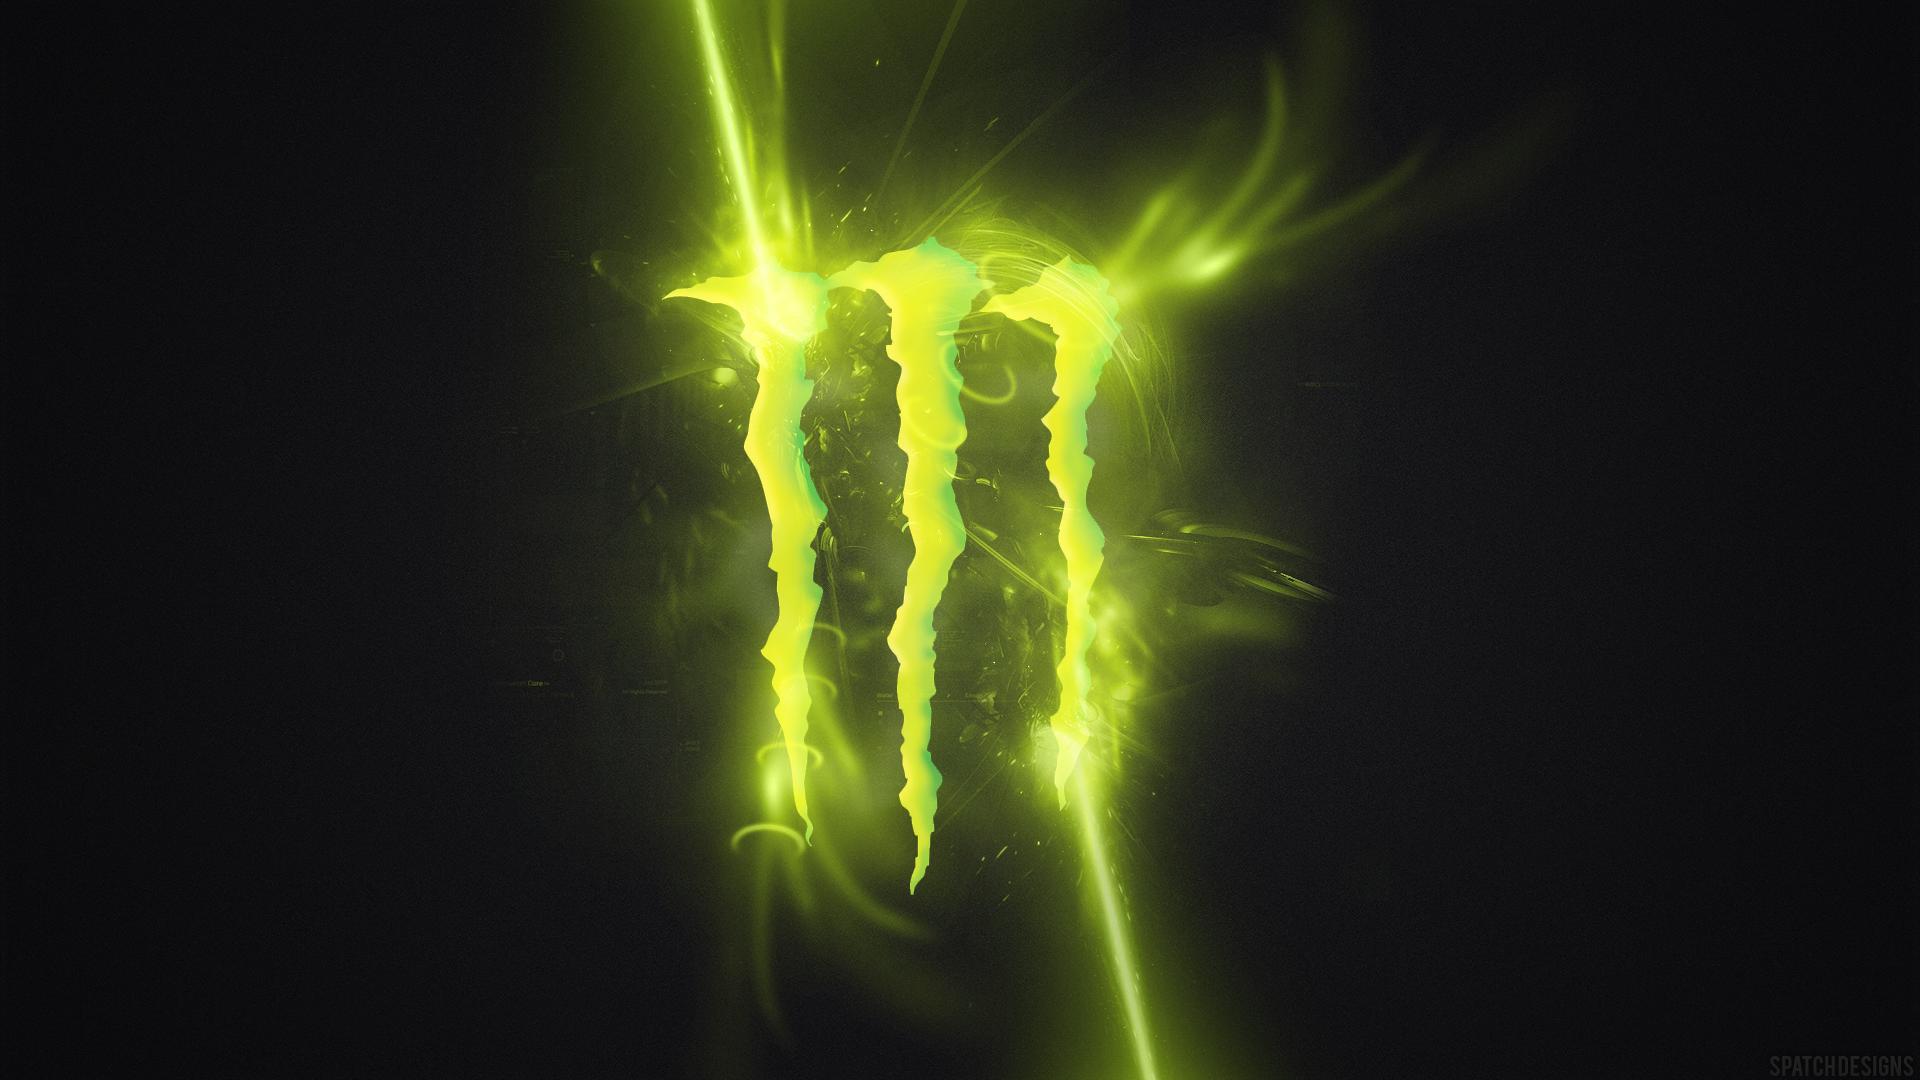 Monster Energy 03 HD Wallpaper Beautiful Monster Energy Logo HD 1920x1080